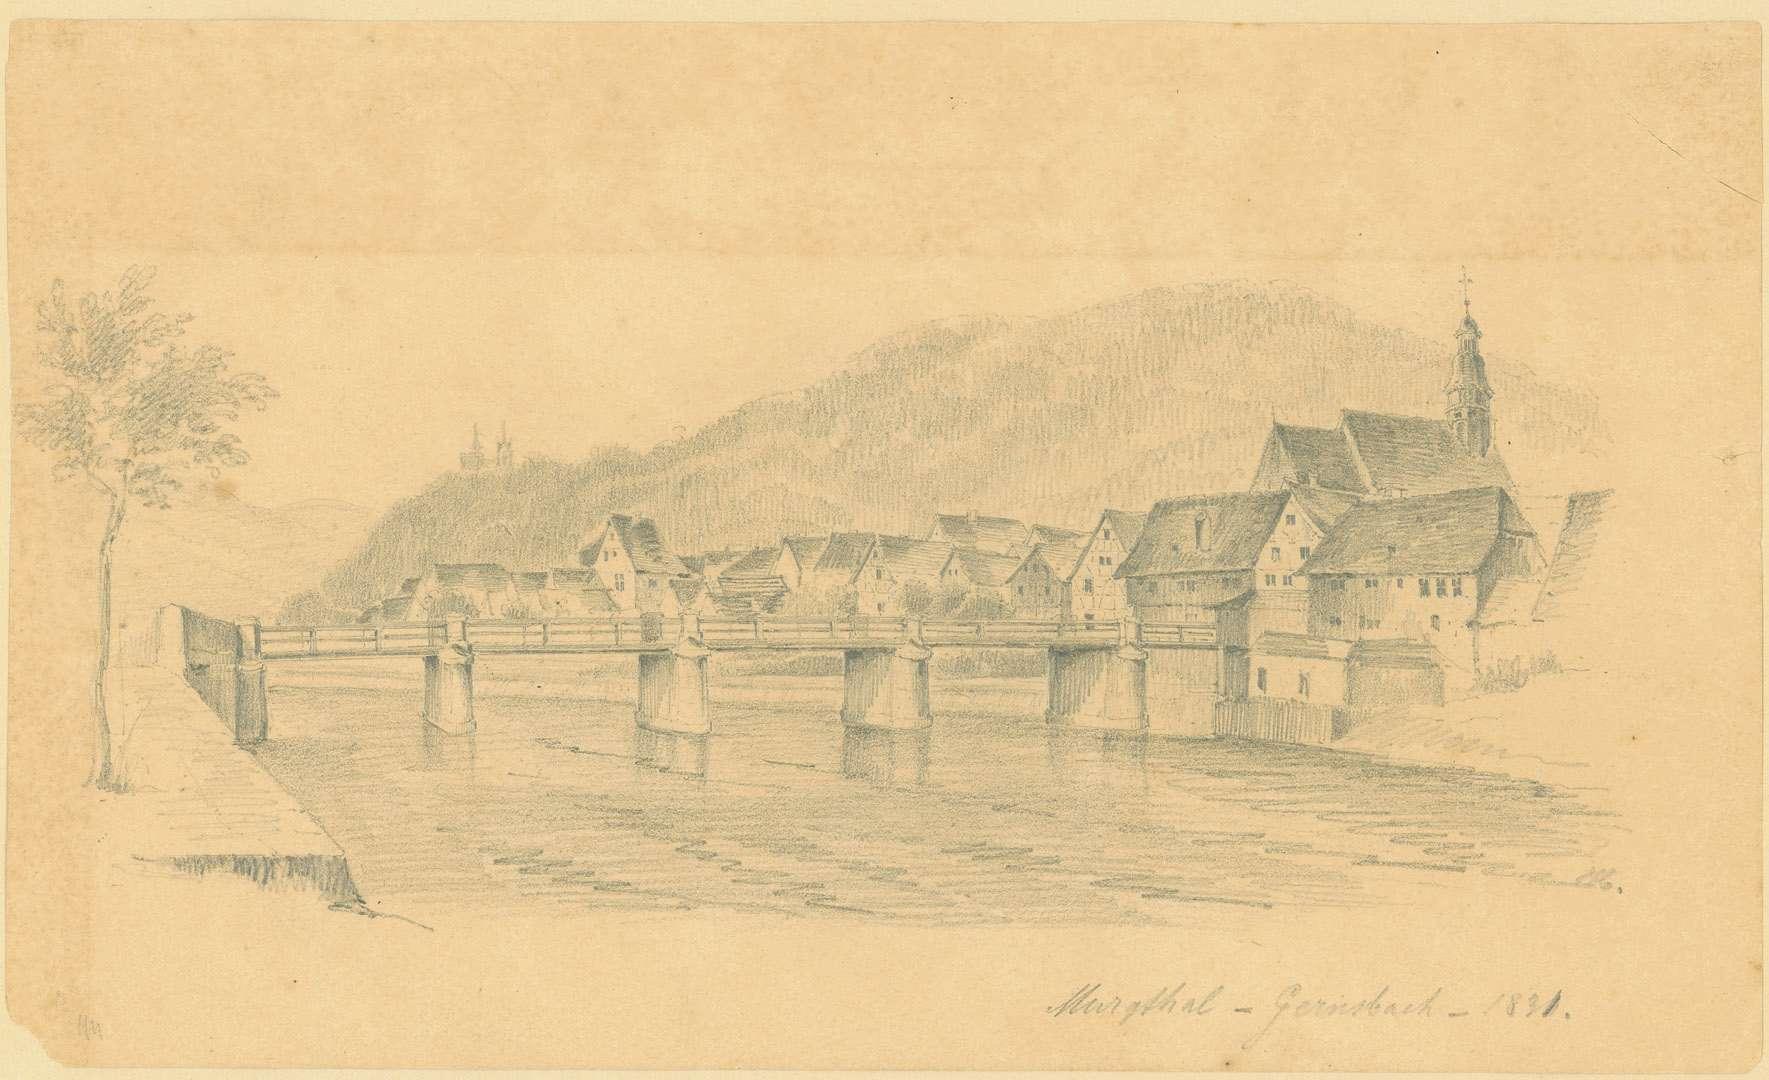 Murgthal - Gernsbach, Bild 1